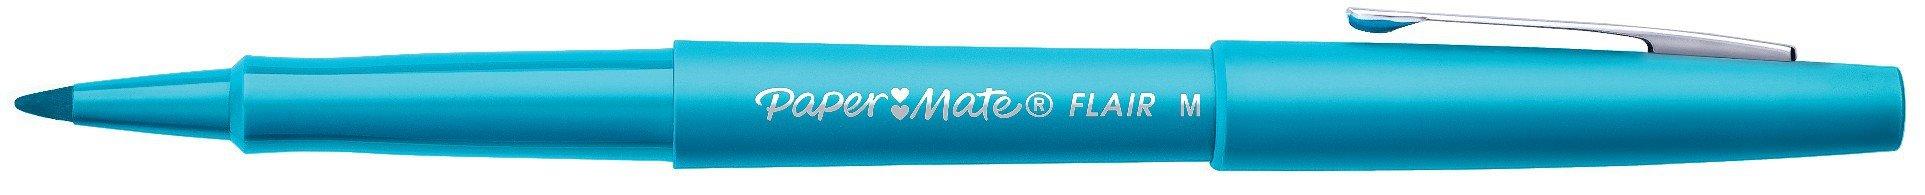 Paper Mate Flair Felt Tip Pen, Medium Point, Sky Blue, 1 Pen by Paper Mate (Image #1)